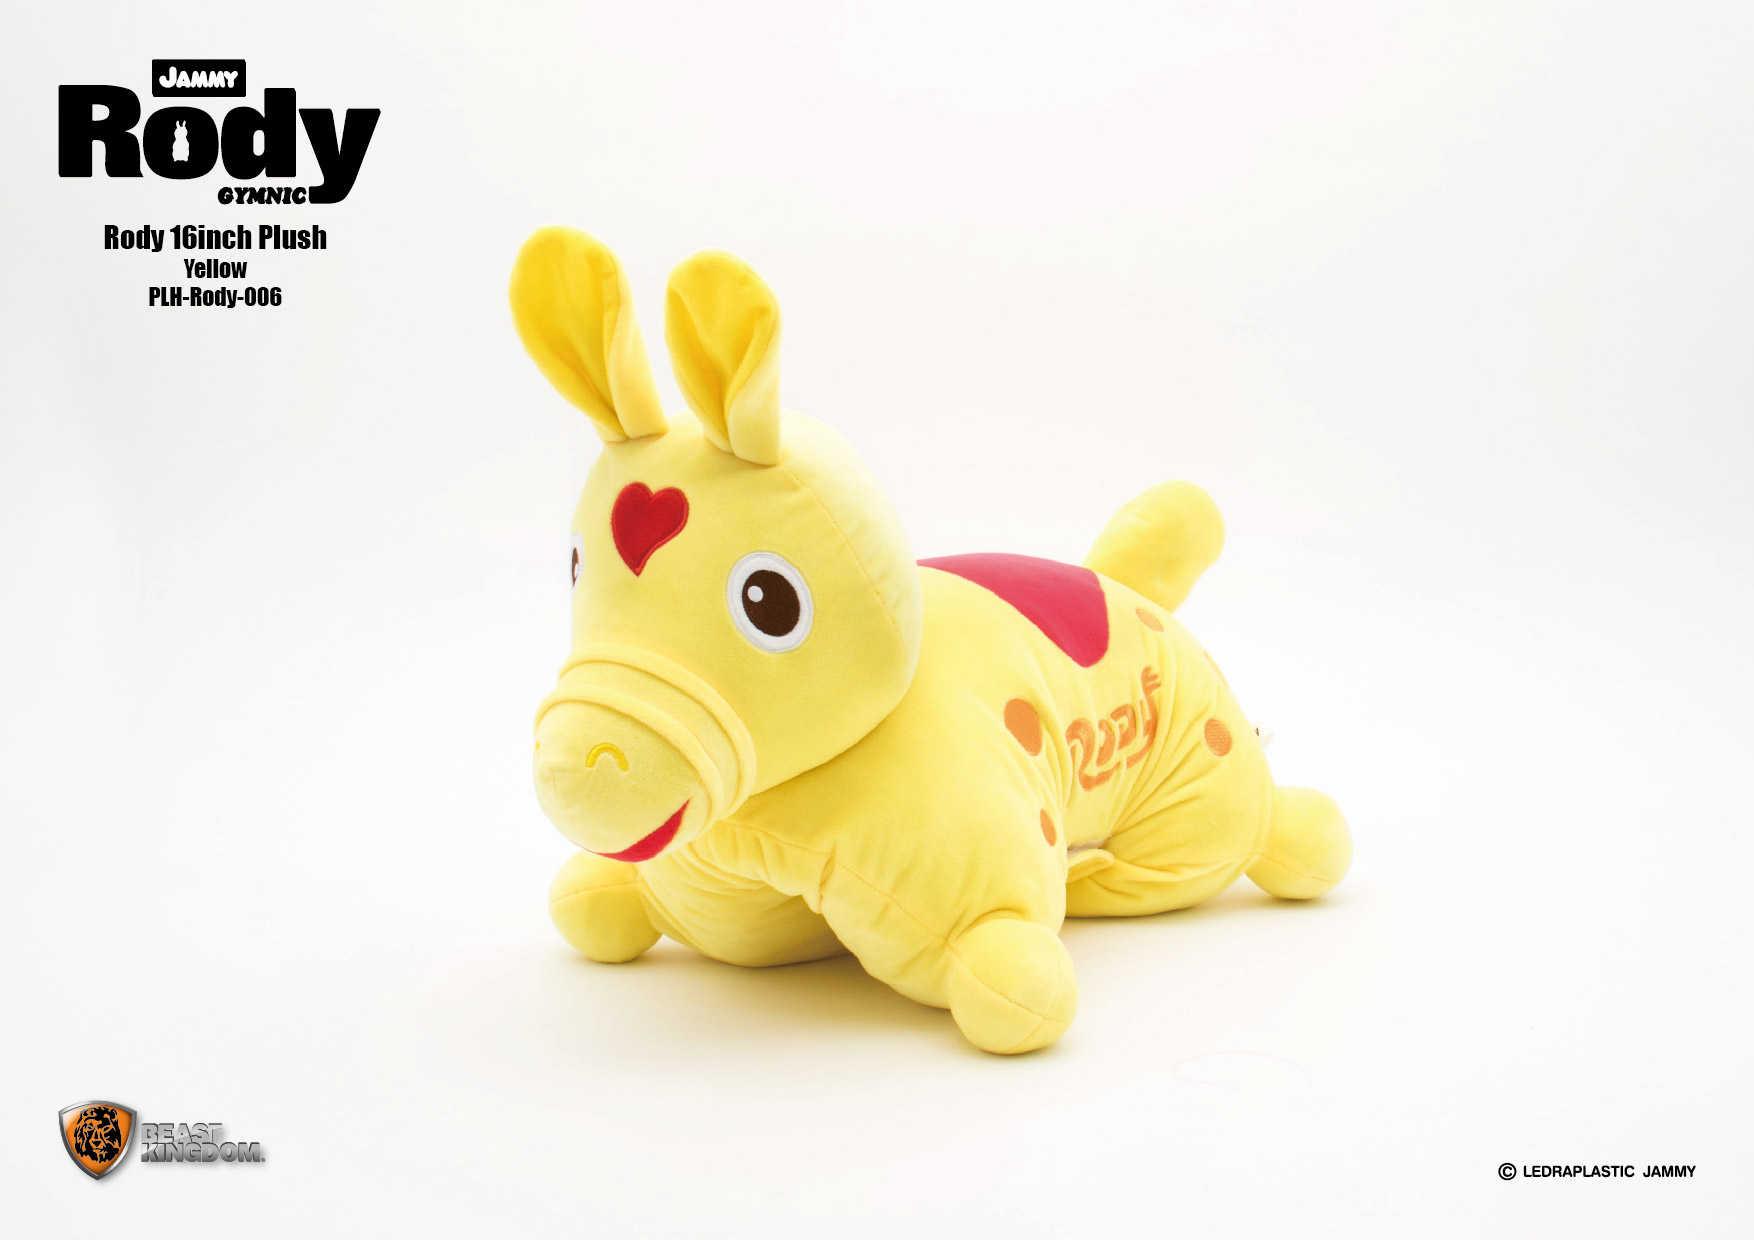 Rody 16吋多功能絨毛玩偶 002 檸檬黃